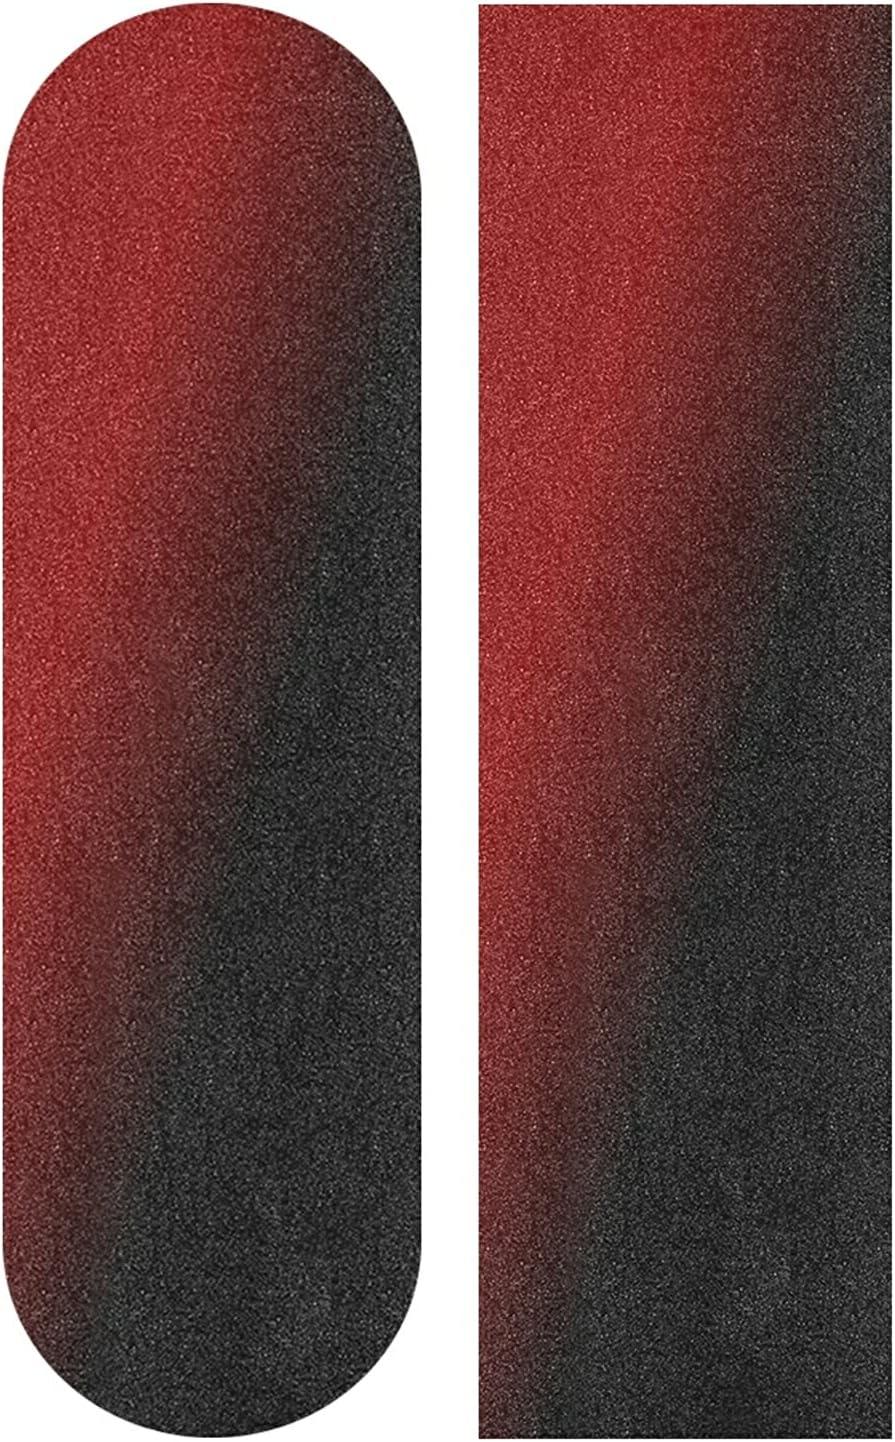 Skateboard Grip Tape Sheet cheap Weekly update 33x9inch Bubble Free Waterp Black Red